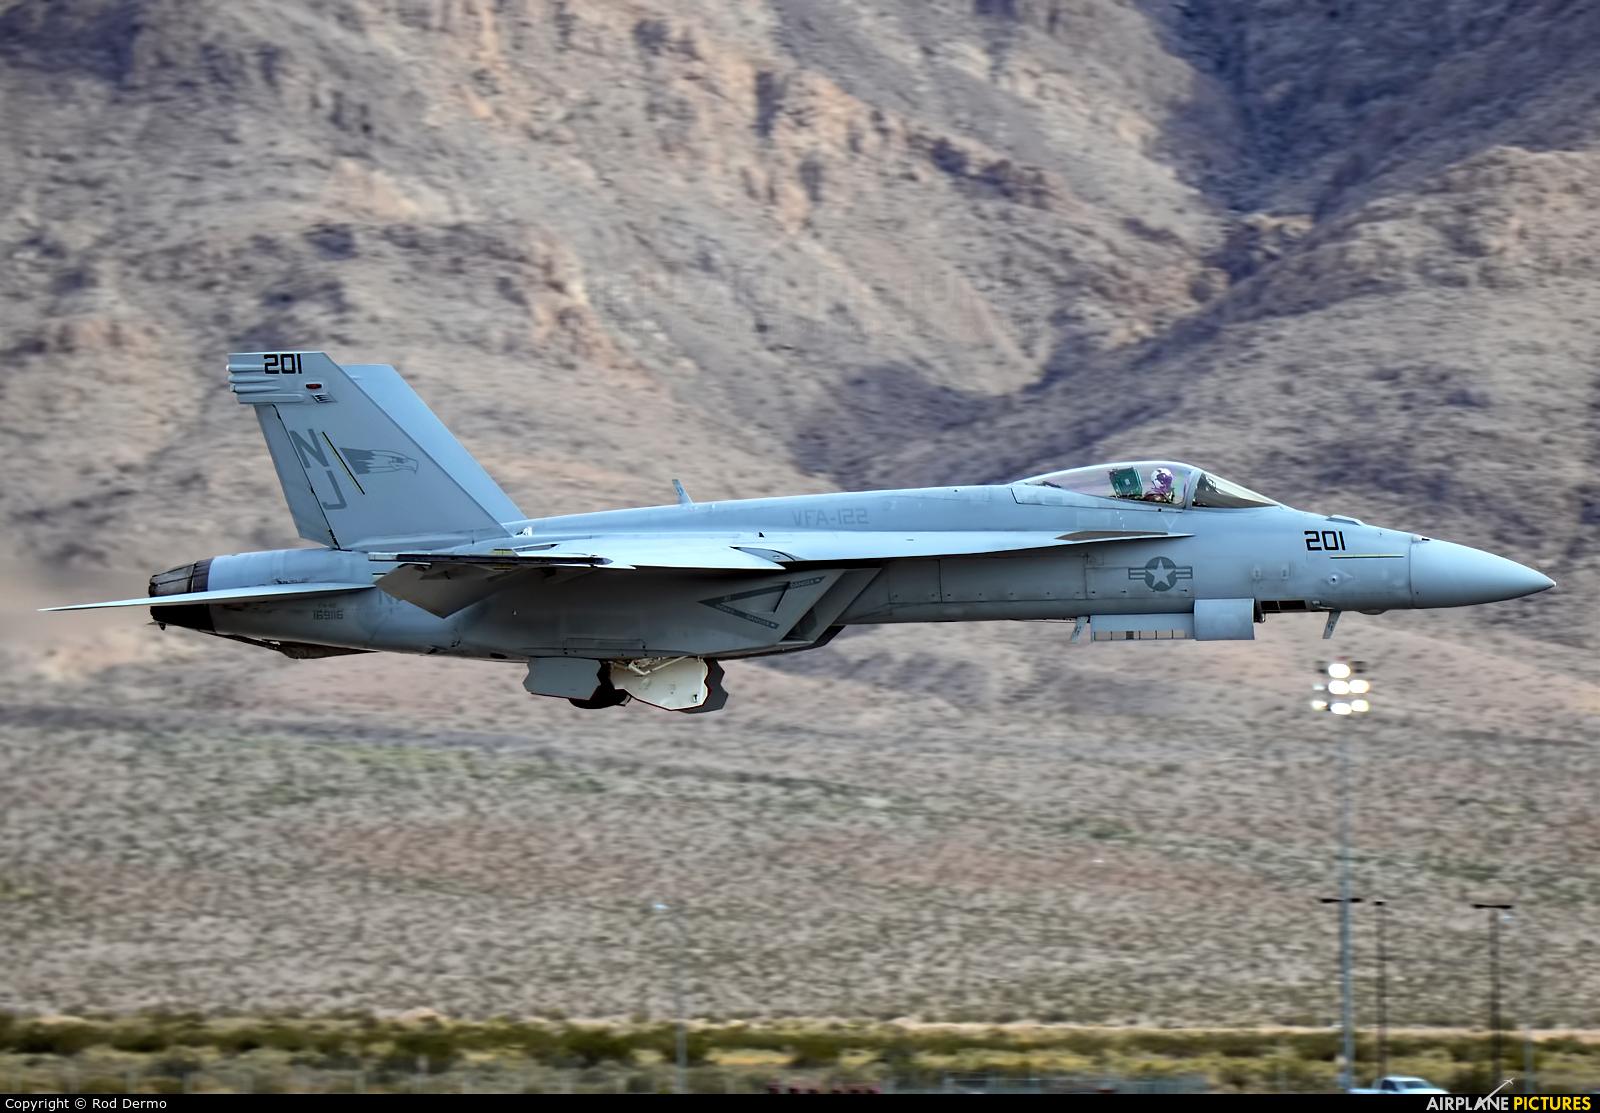 USA - Navy 169116 aircraft at Nellis AFB